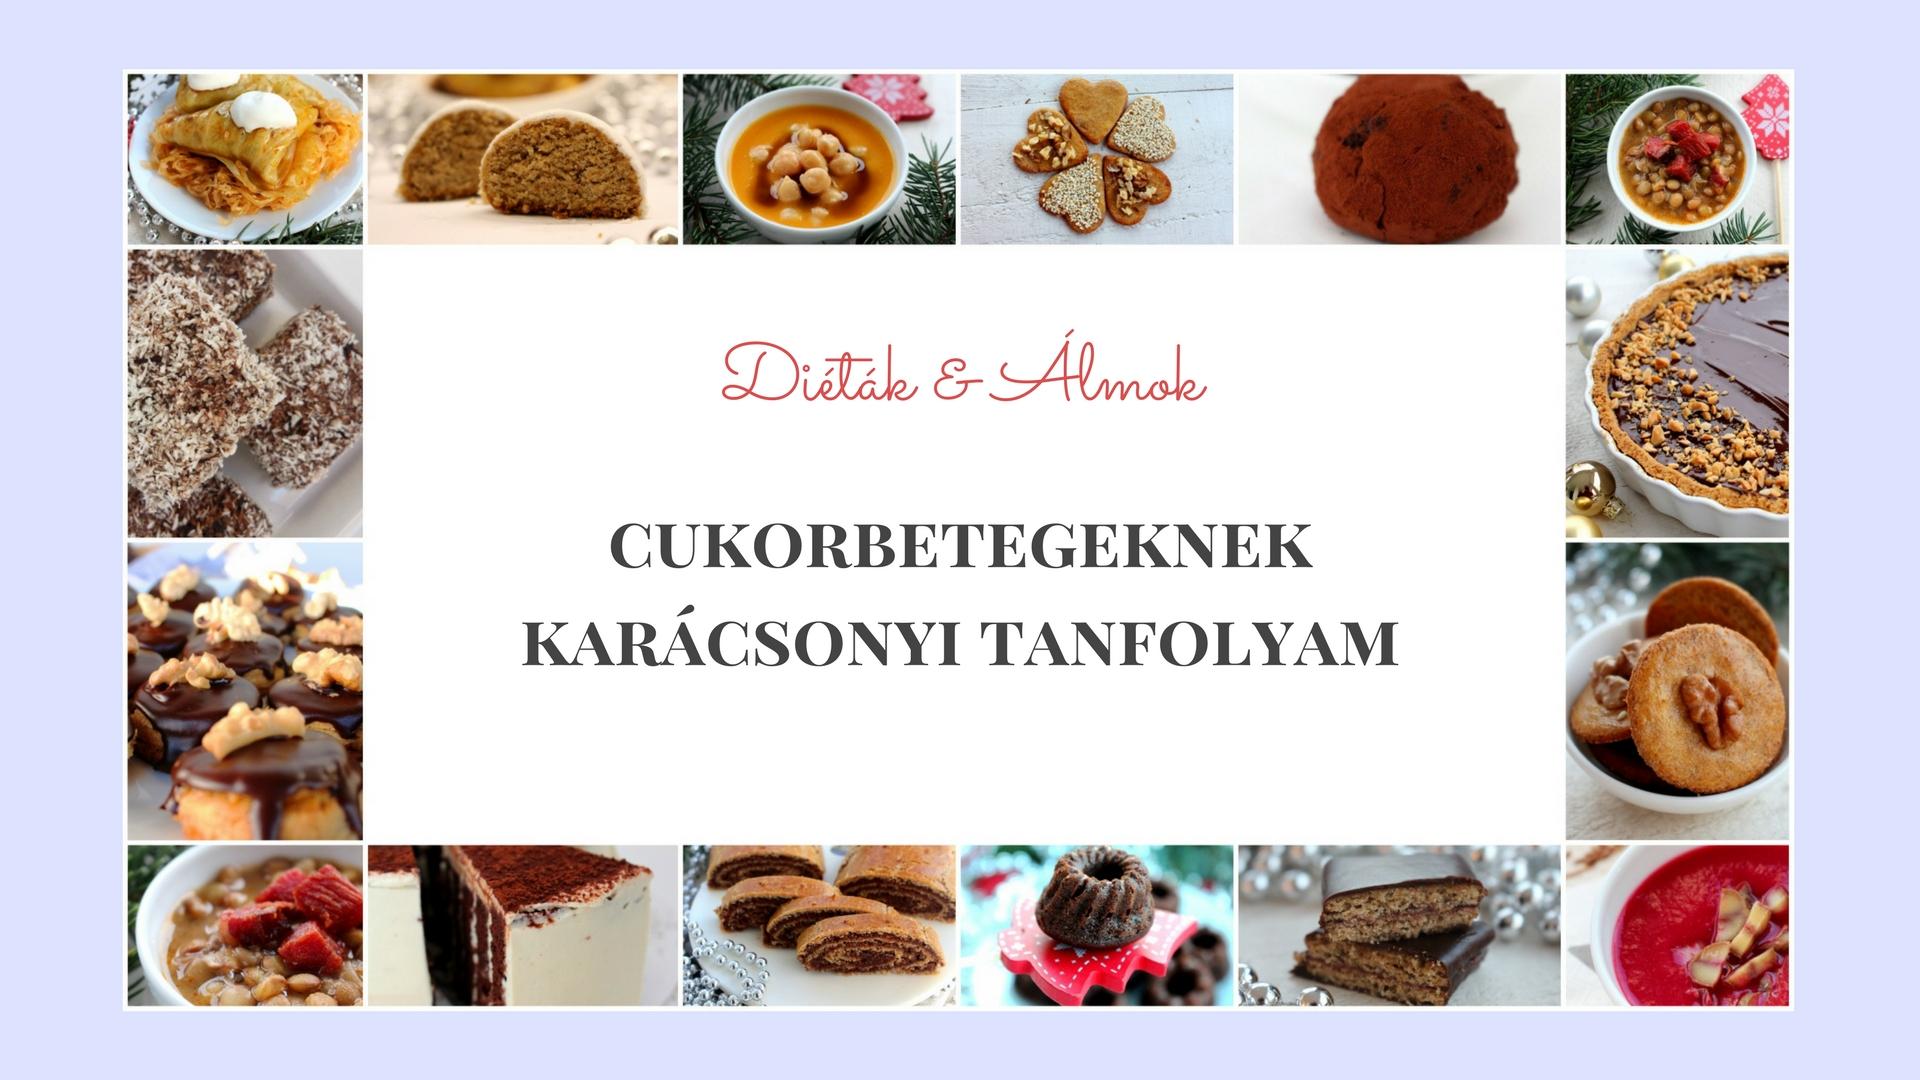 dietak_almok_karacsonyi_szenhidrat_dieta_tanfolyam_2017_cukorbetegseg.jpg